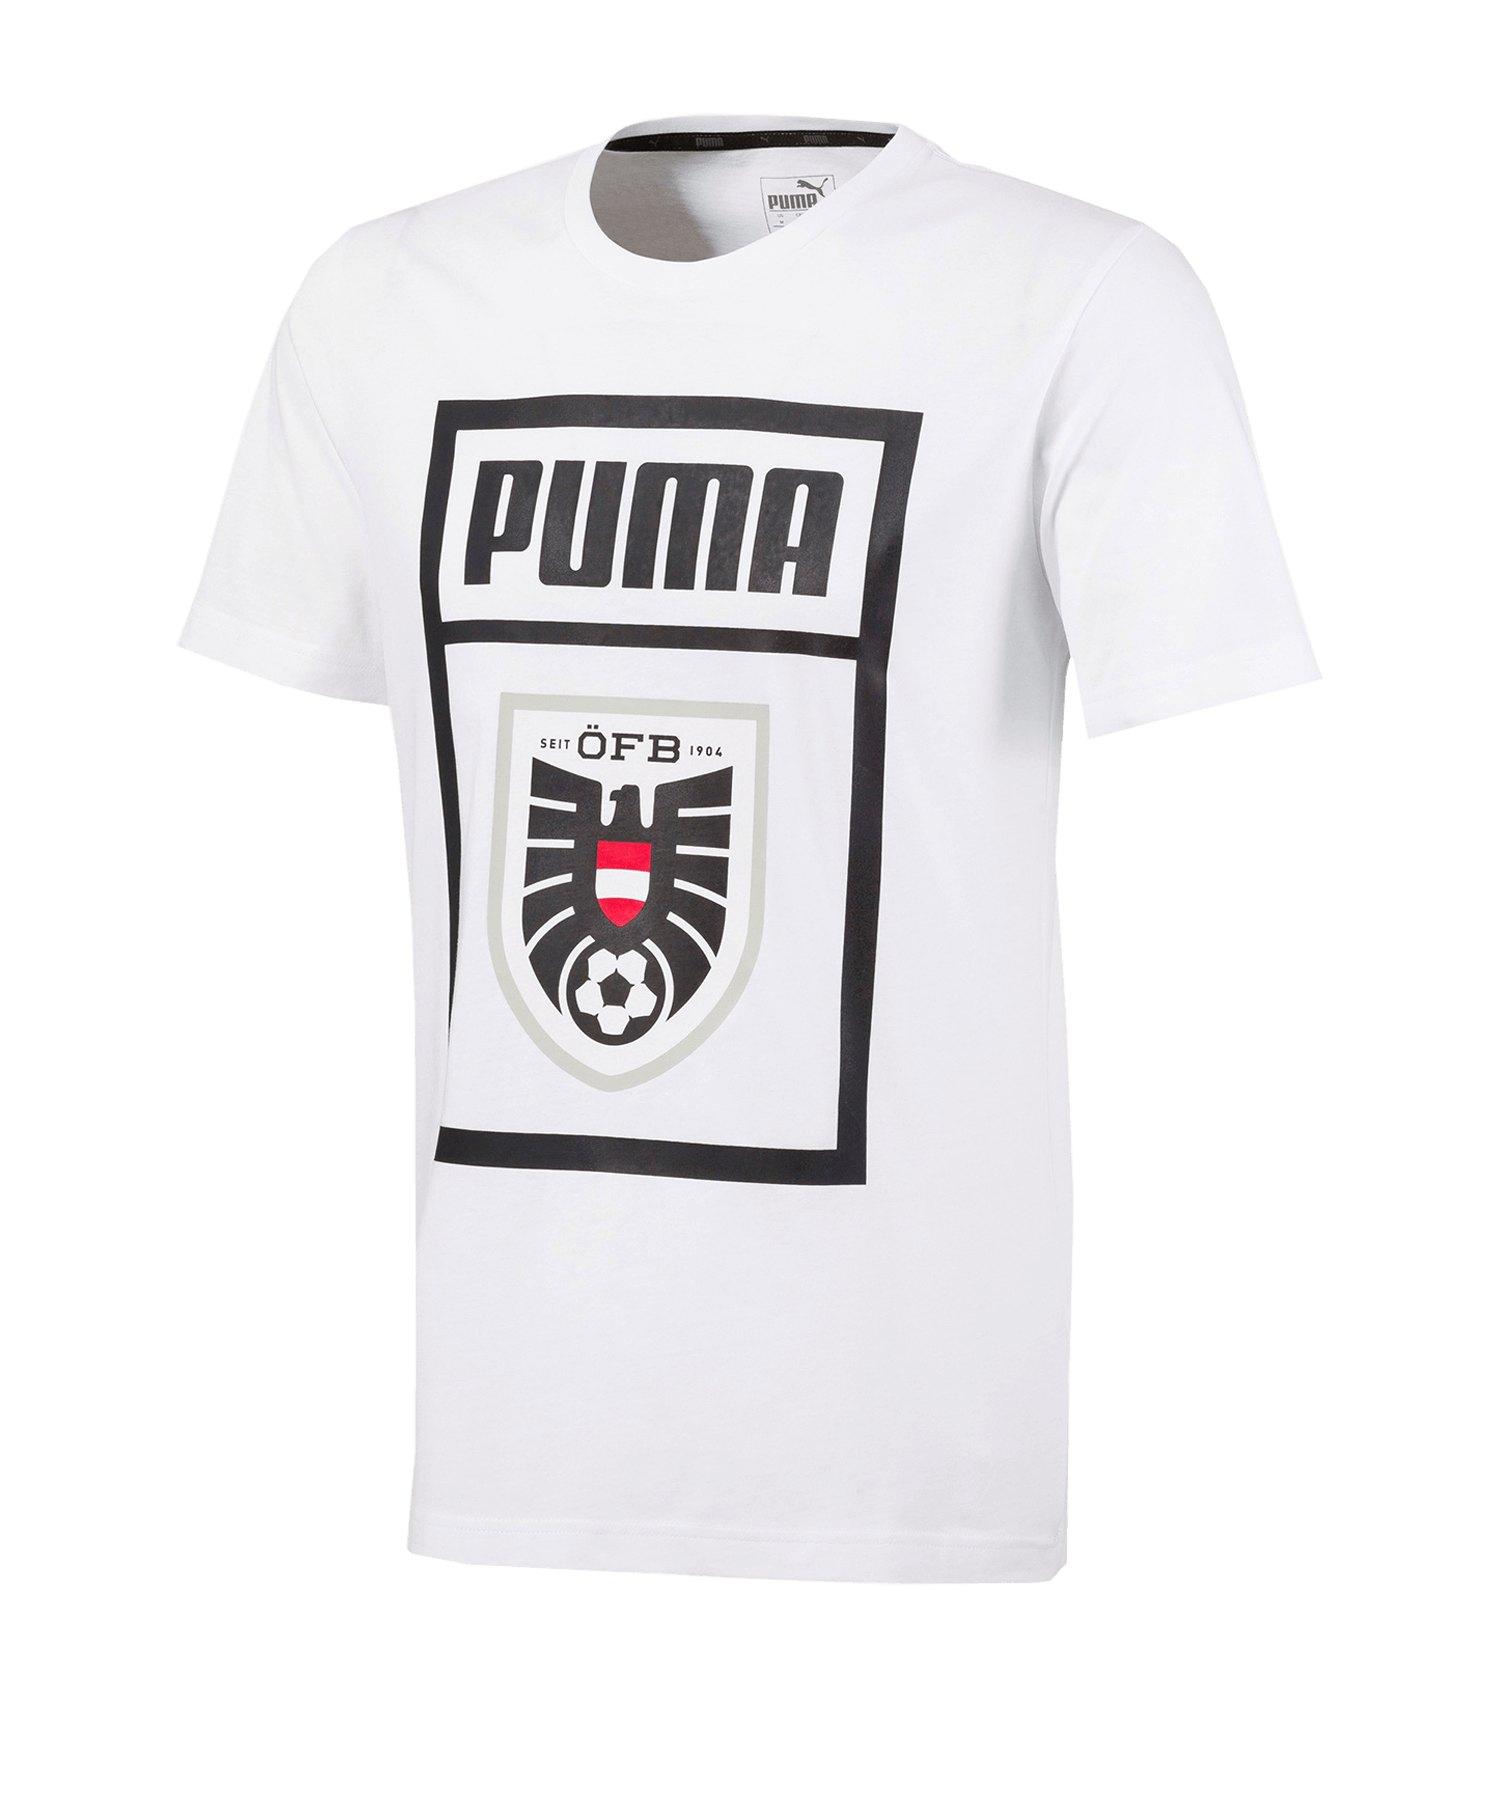 PUMA Österreich DNA Tee T-Shirt Weiss F02 - weiss